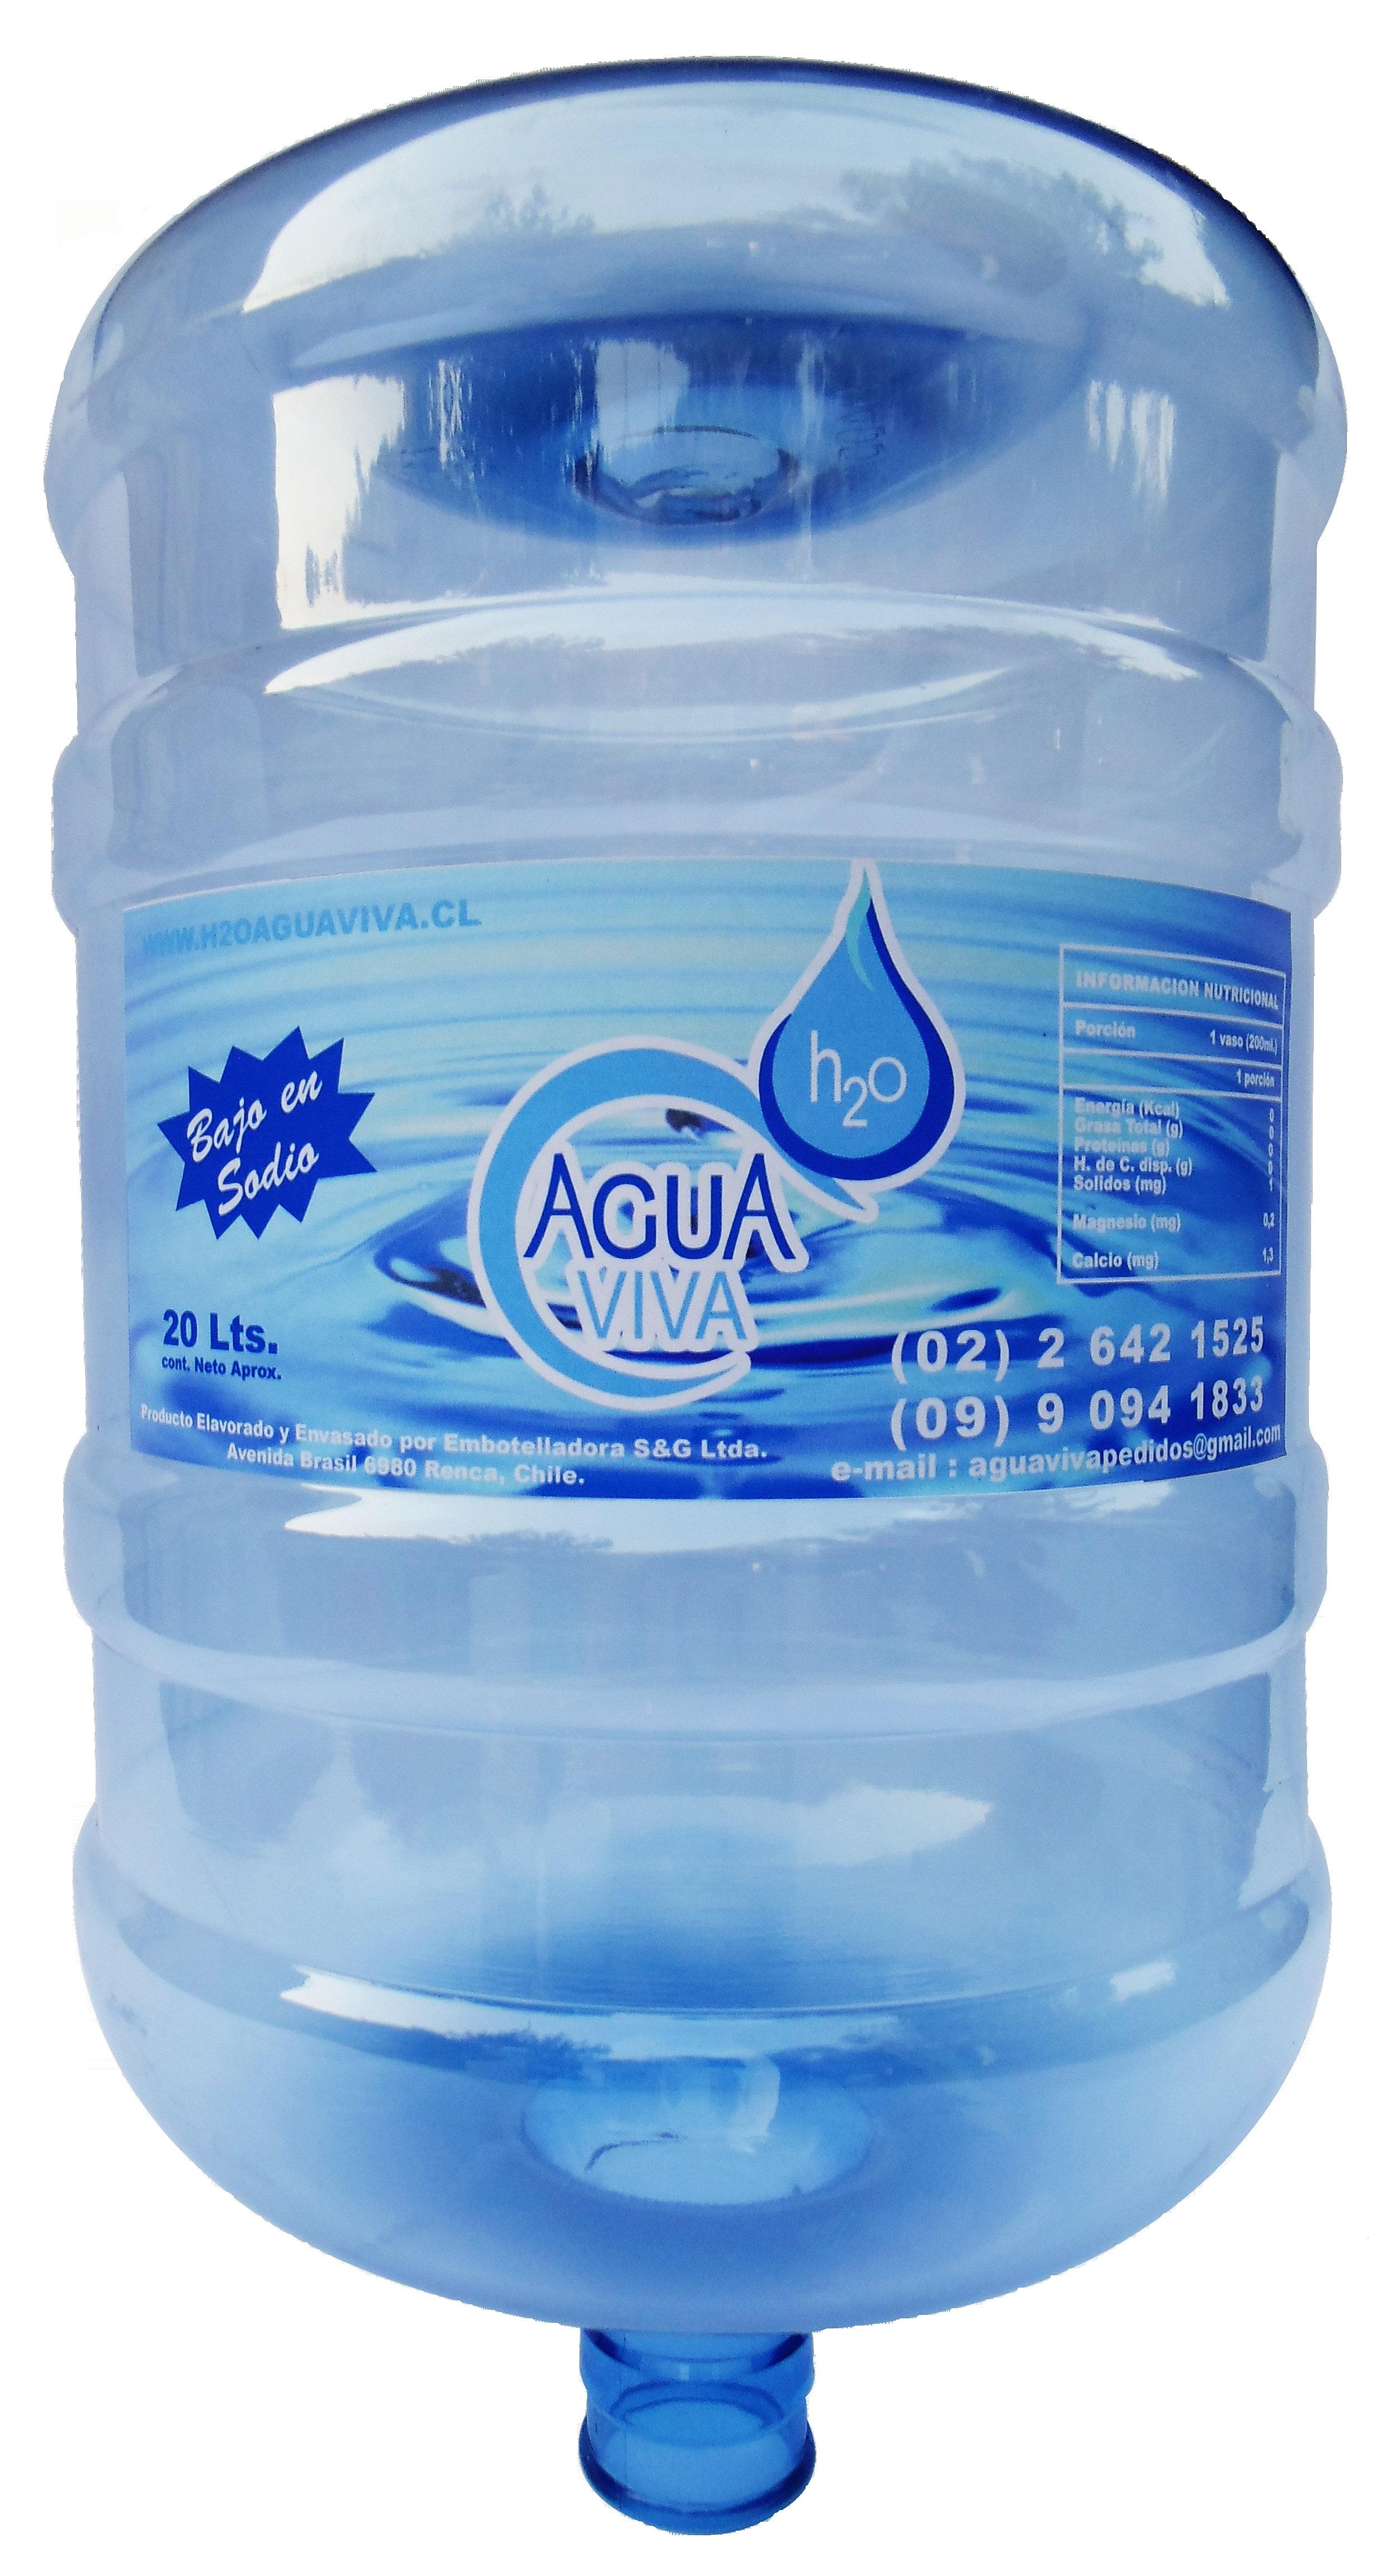 H2O Agua Viva | Agua purificada | RECARGA BOTELLÓN 20 Lt.